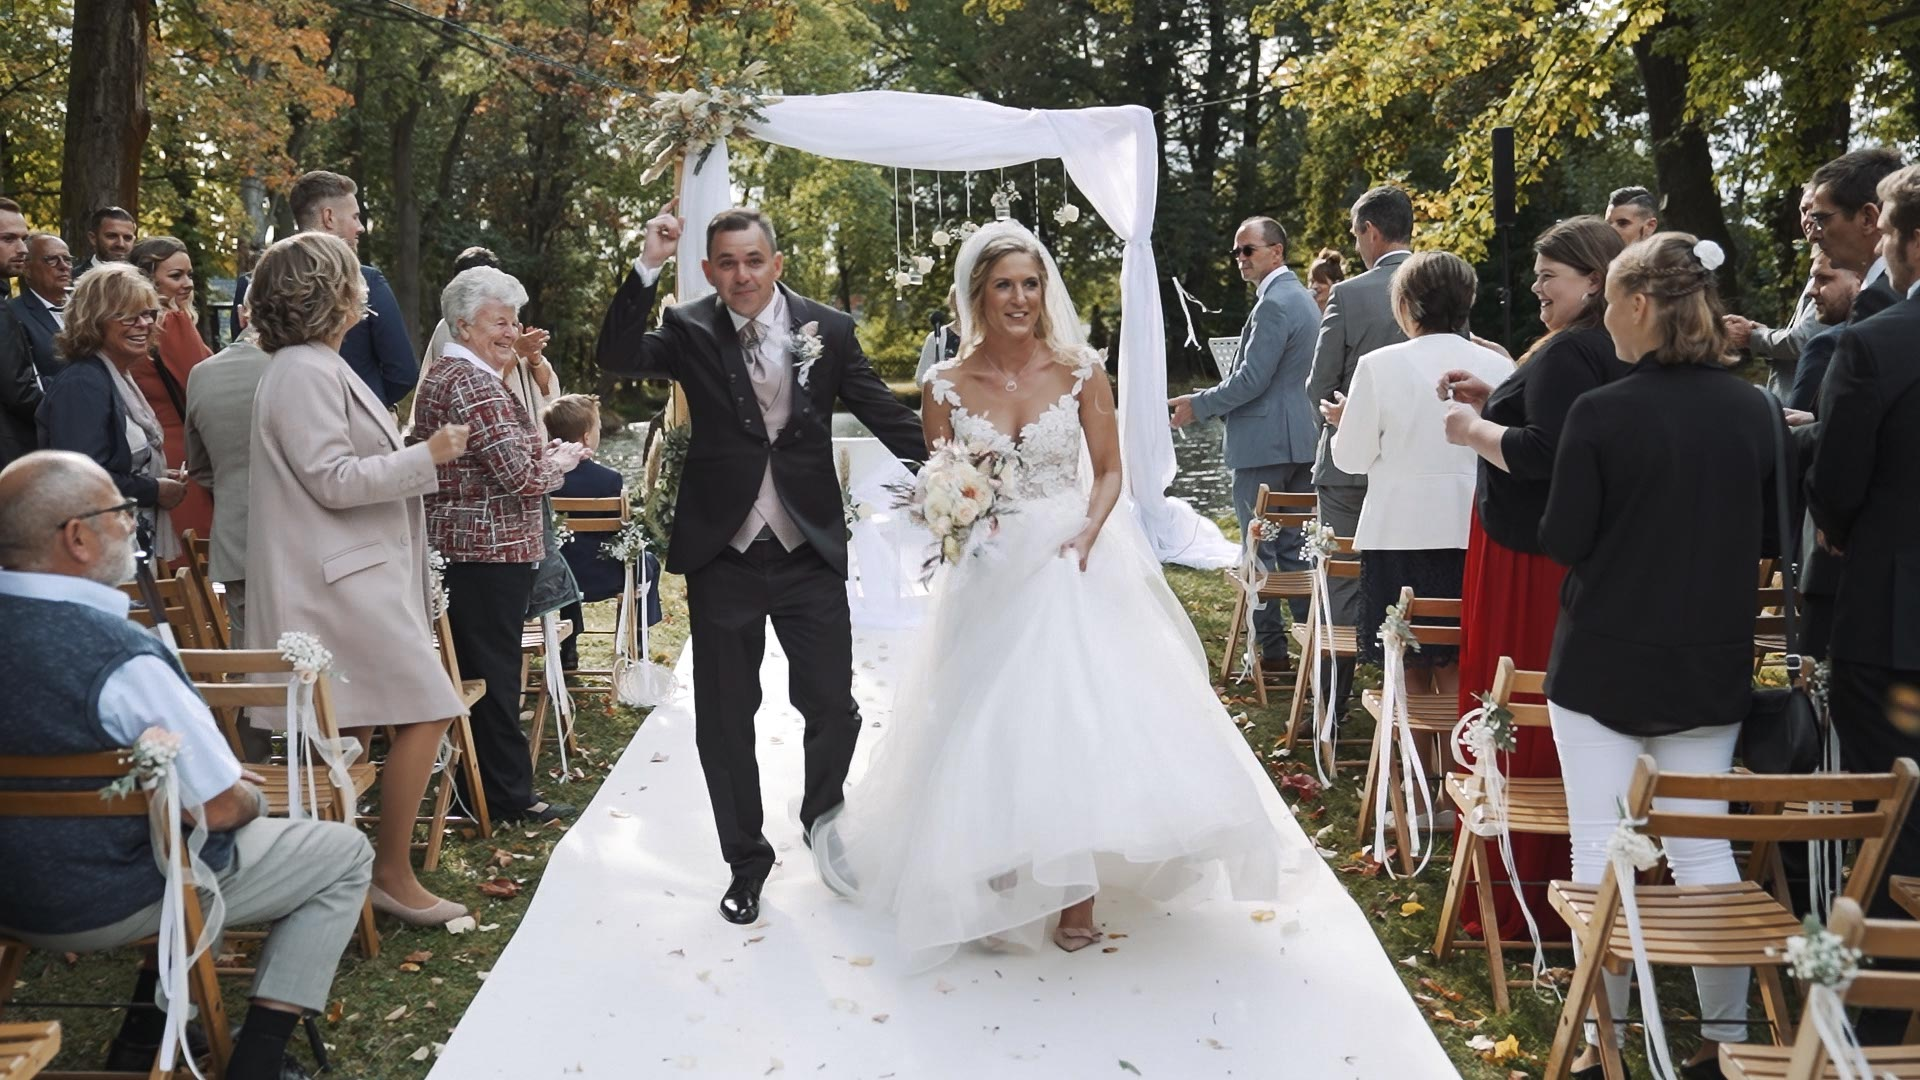 Pascal & Jenny Hochzeitsfilm Schloss Vettelhoven Videograf Hochzeit Filmemacher 050